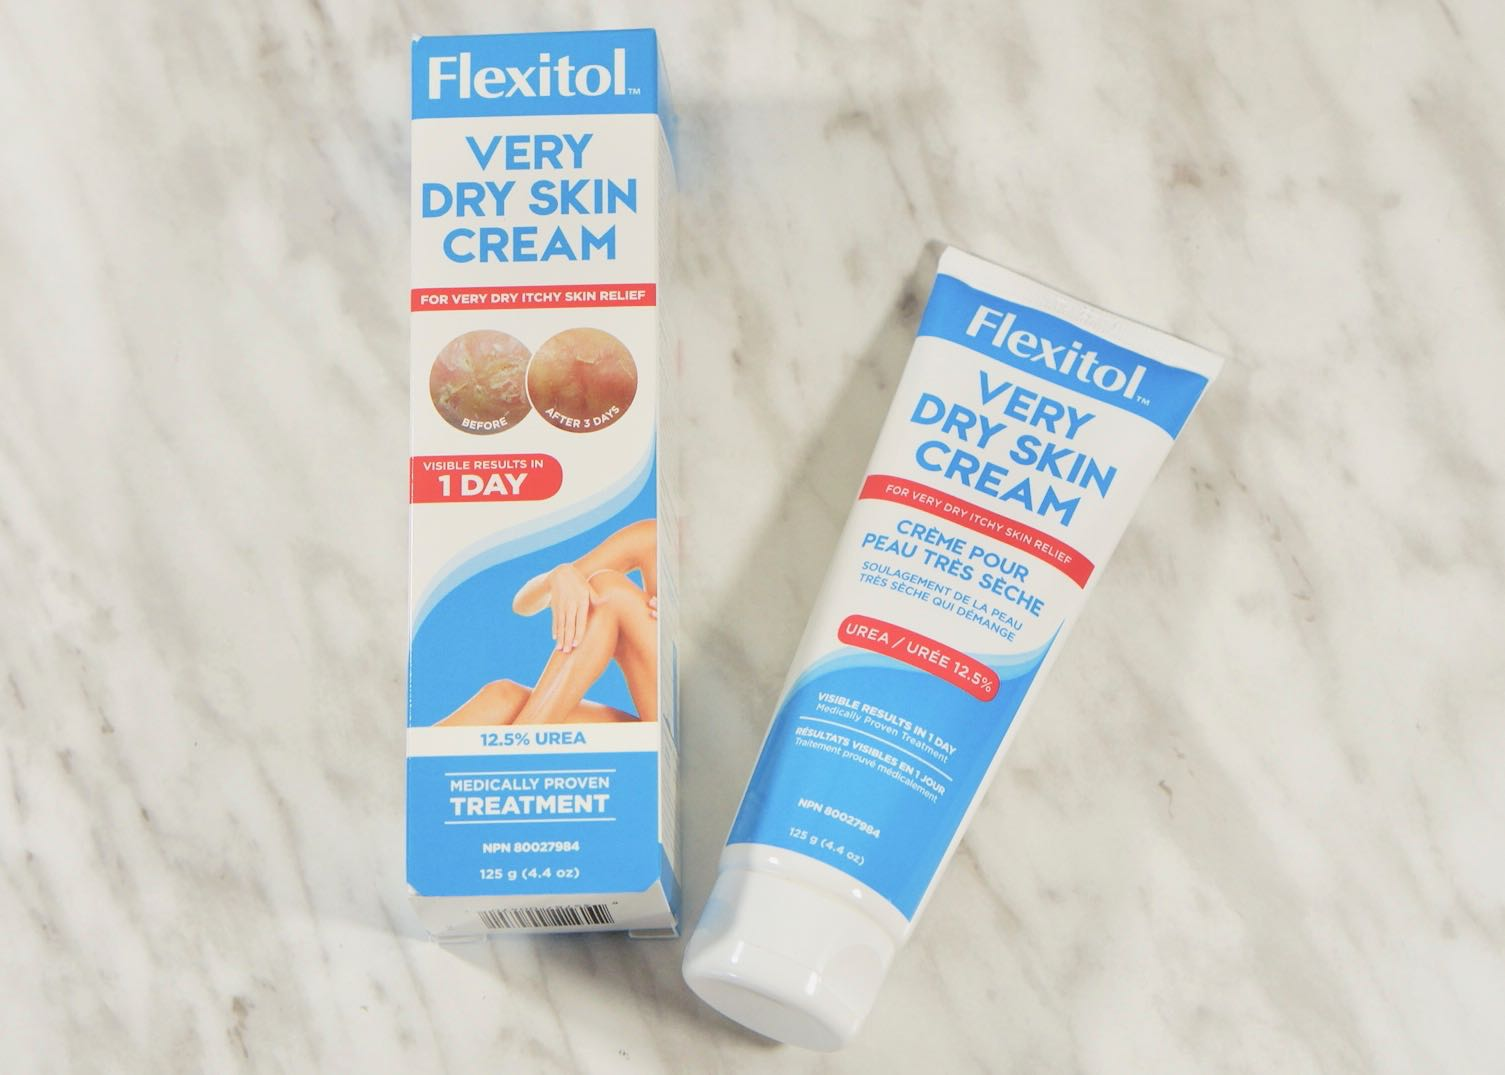 Flexitol-Very Dry Skin CreamFlexitolDSC09257.jpg